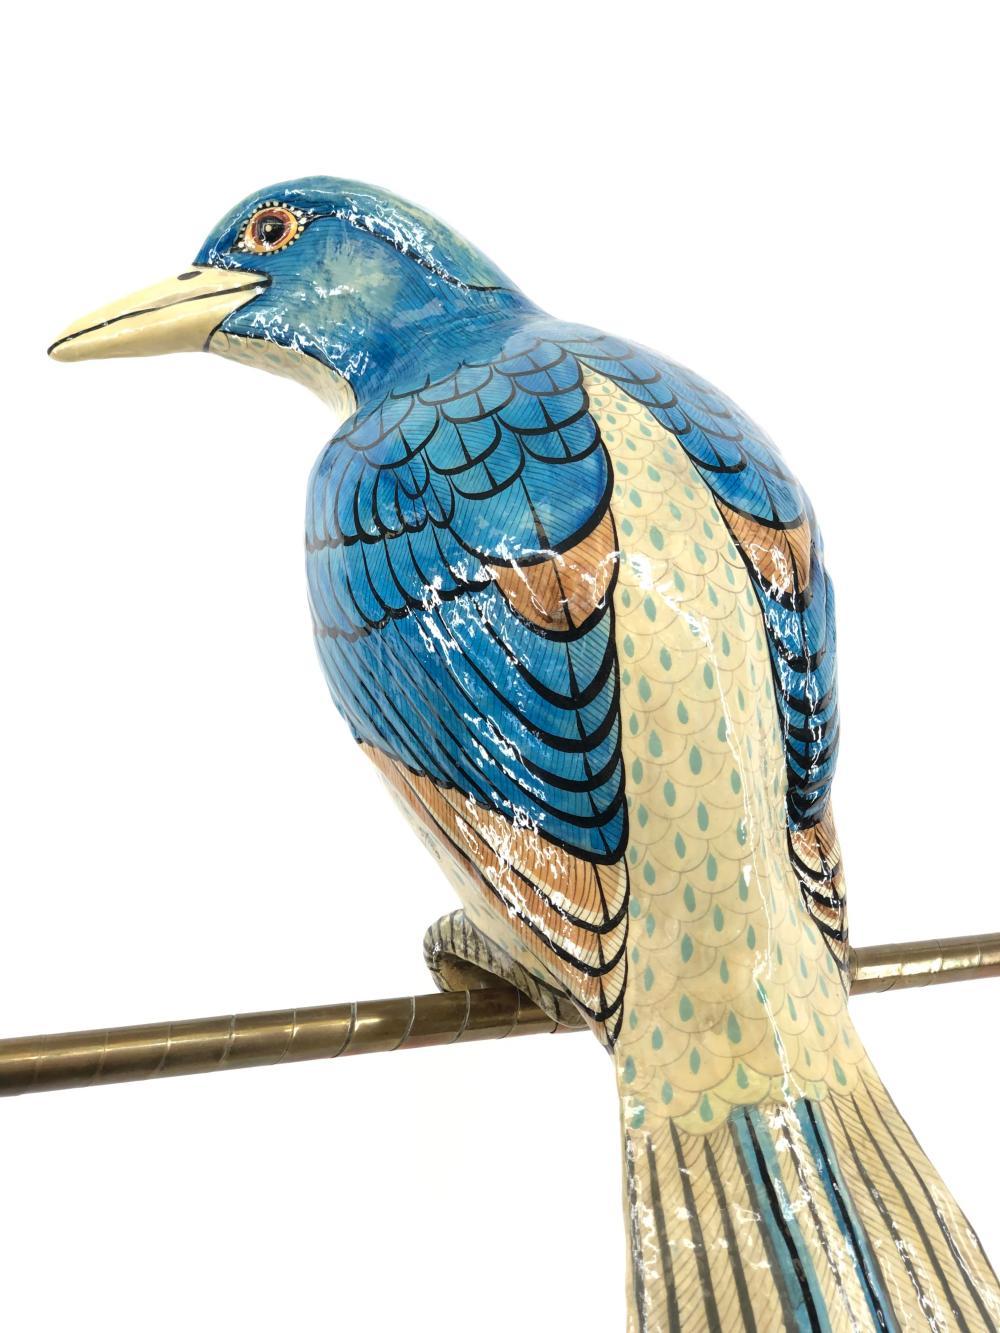 LARGE 3FT SIGNED SERGIO BUSTAMANTE LIMITED EDITION PAPER MACHE MOTMOT BIRD SCULPTURE